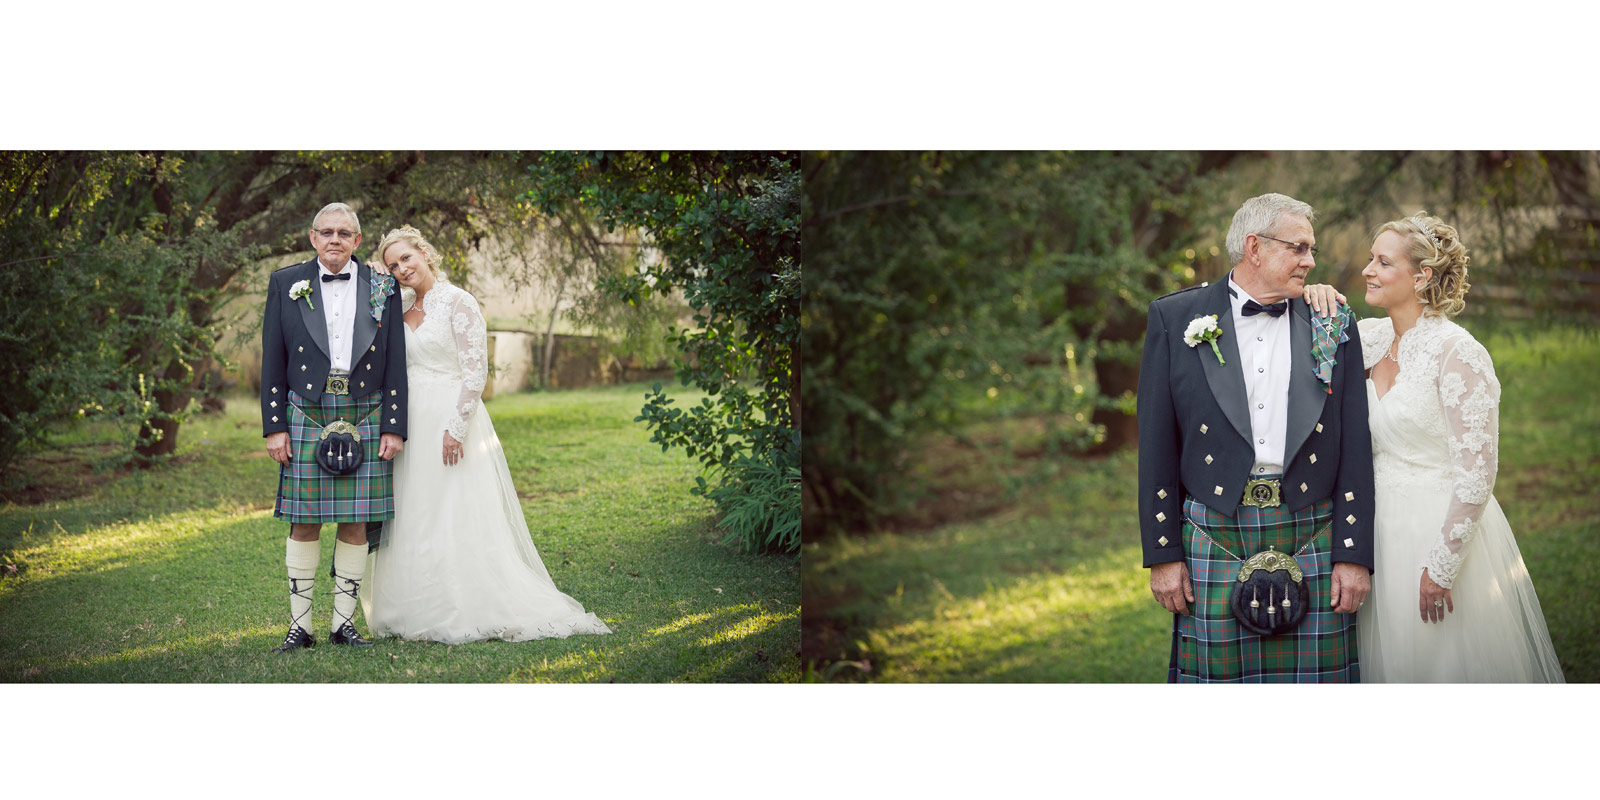 Nathalie Boucry Photography | Deidre and Lister Wedding Album 018